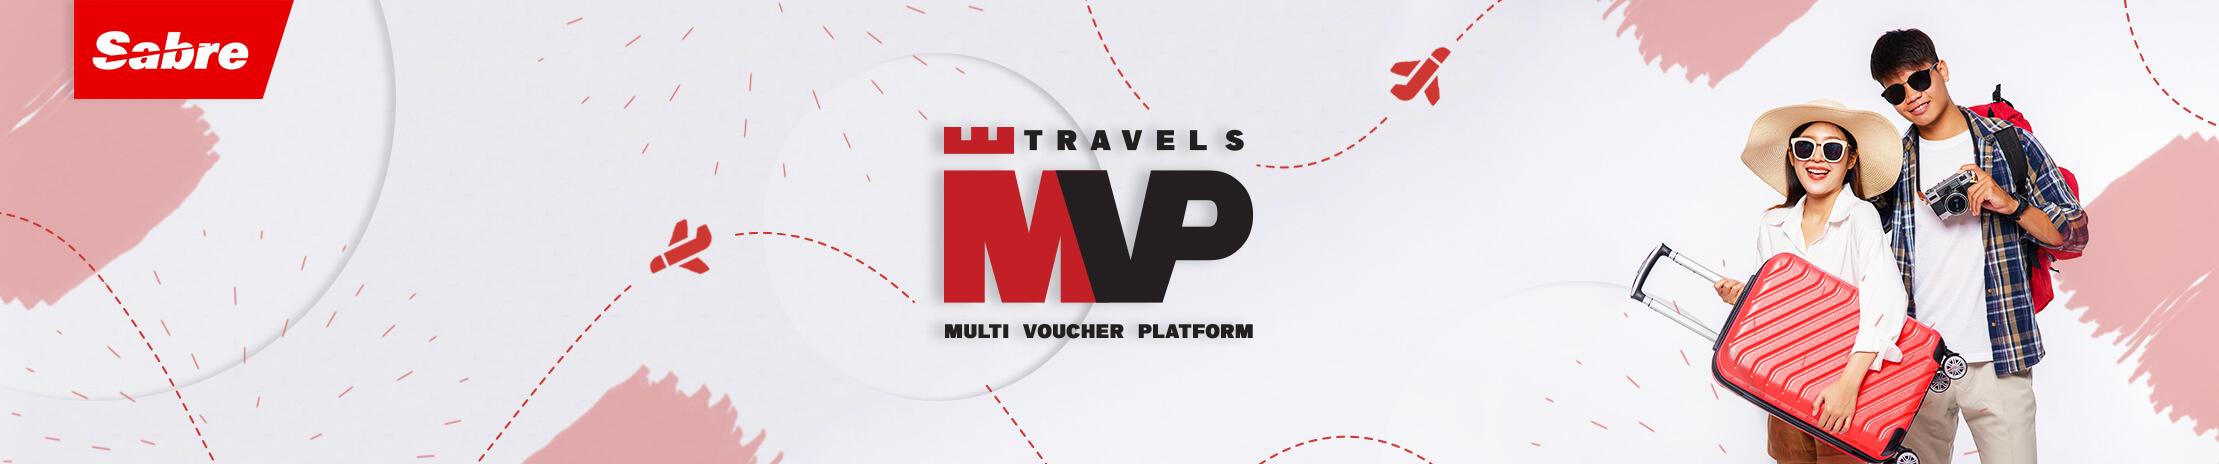 banner-travelsmvp-b2c-1616466506